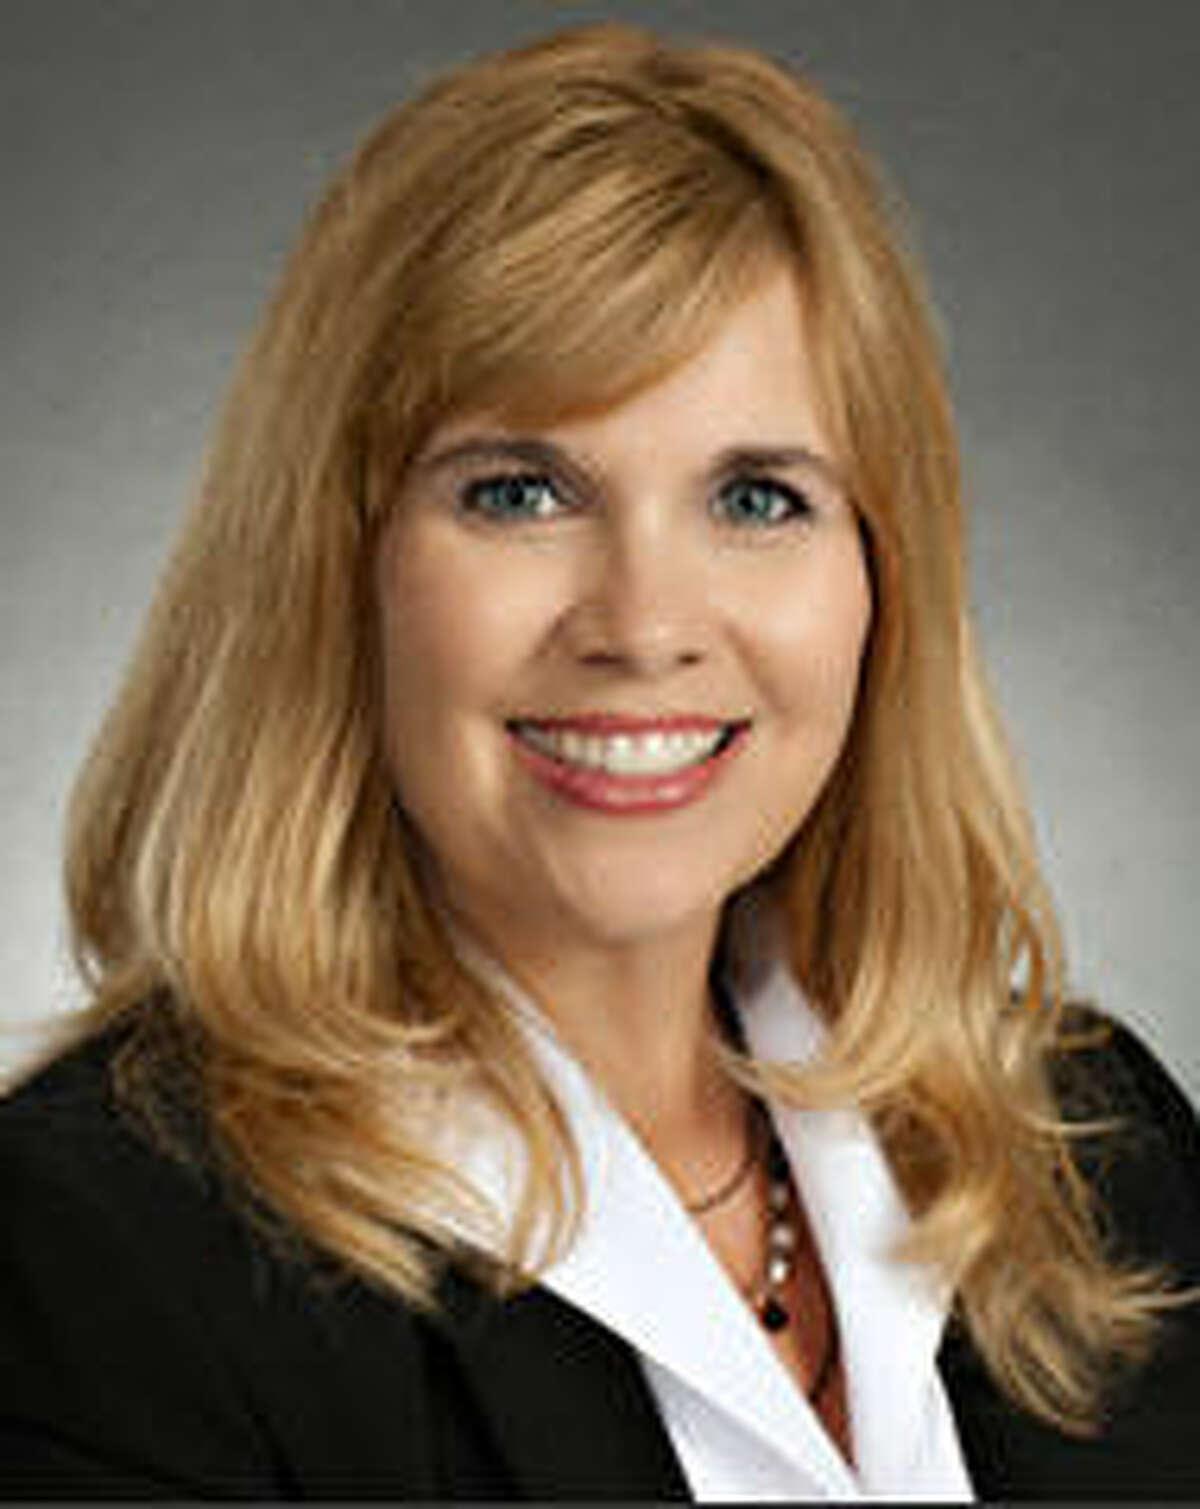 Kristin Tassin, Fort Bend ISD trustee